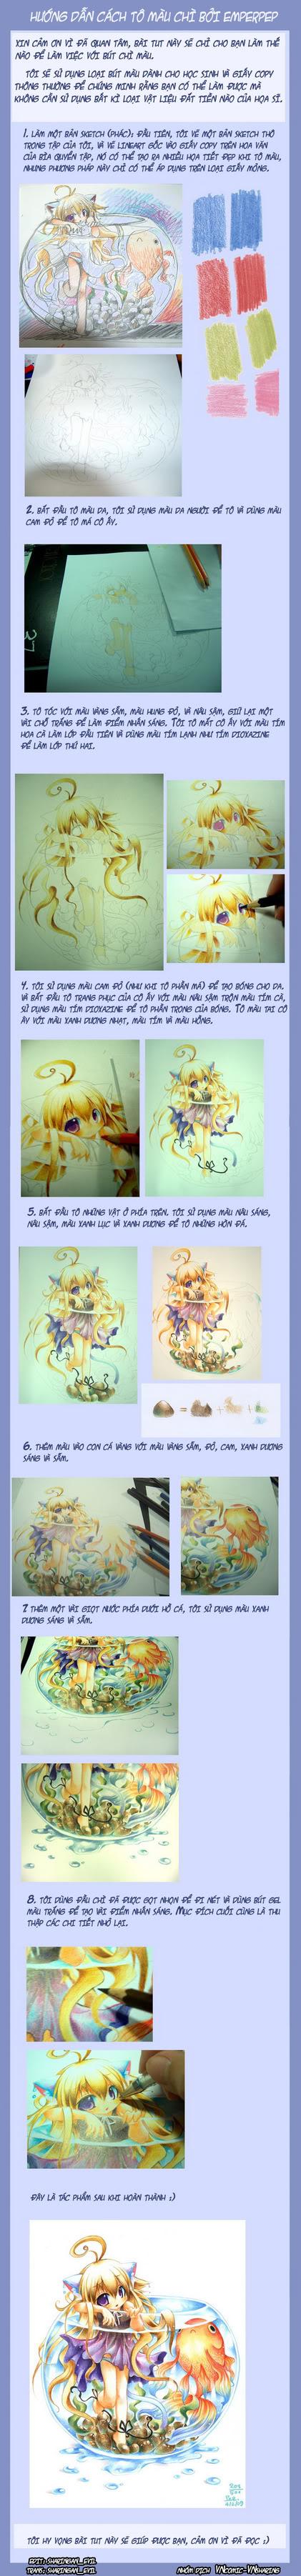 cách tô màu chì Colored_pencil_tutorial_by_emper-1